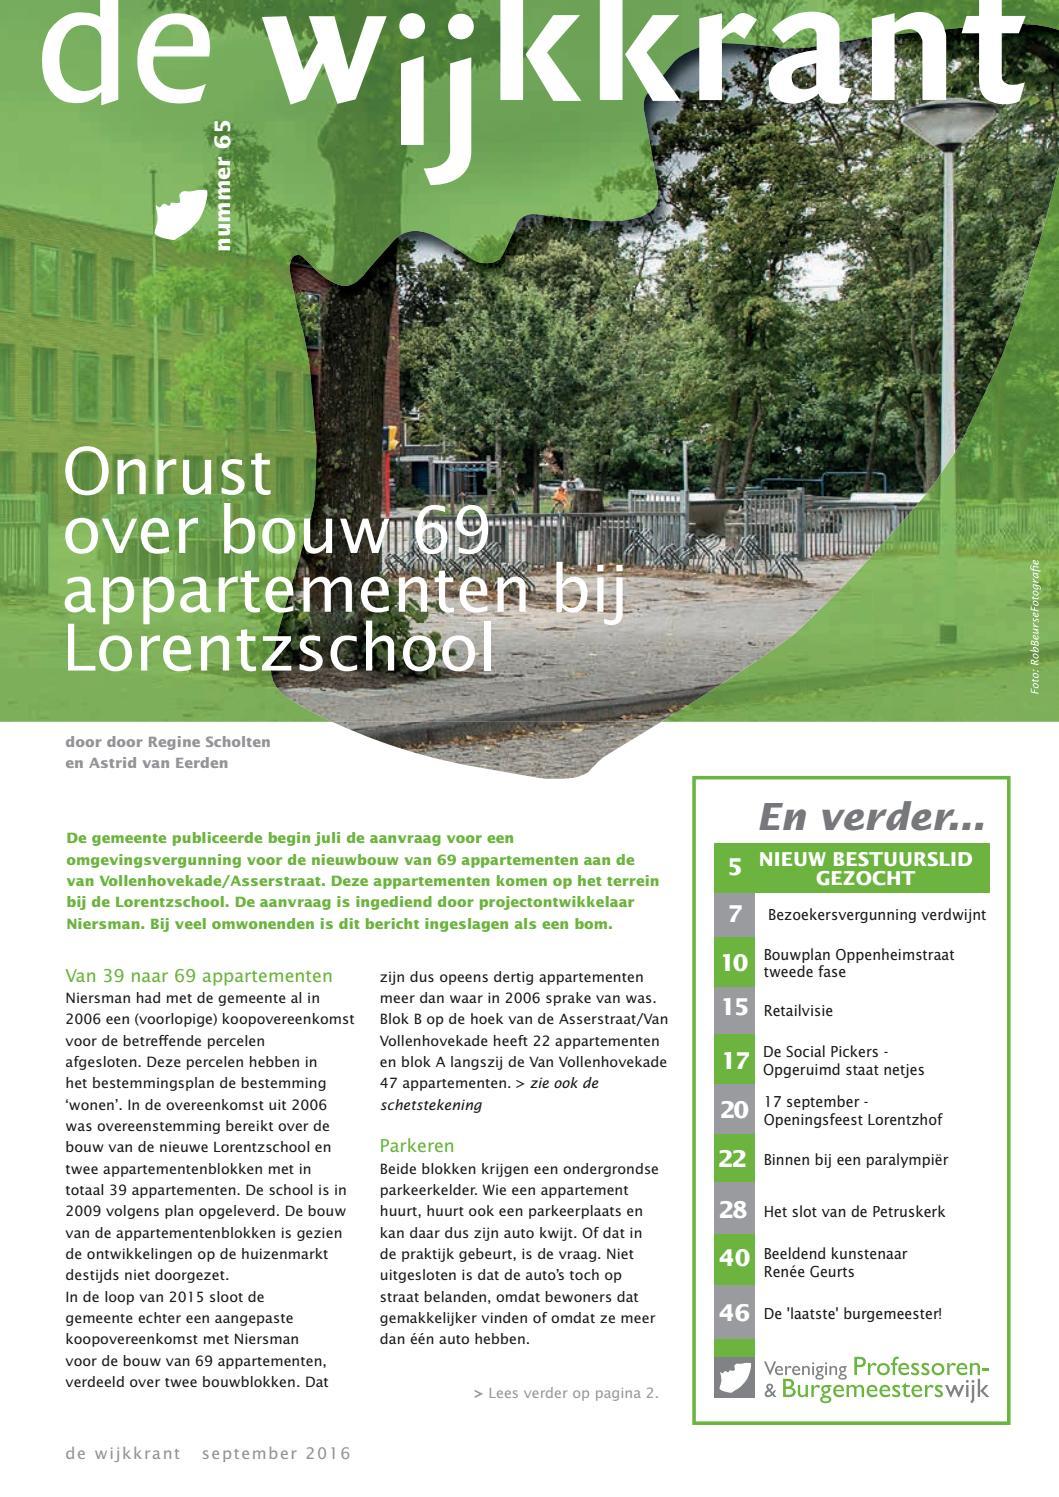 Wijkkrant september 2016 by Pico Communicatie - issuu